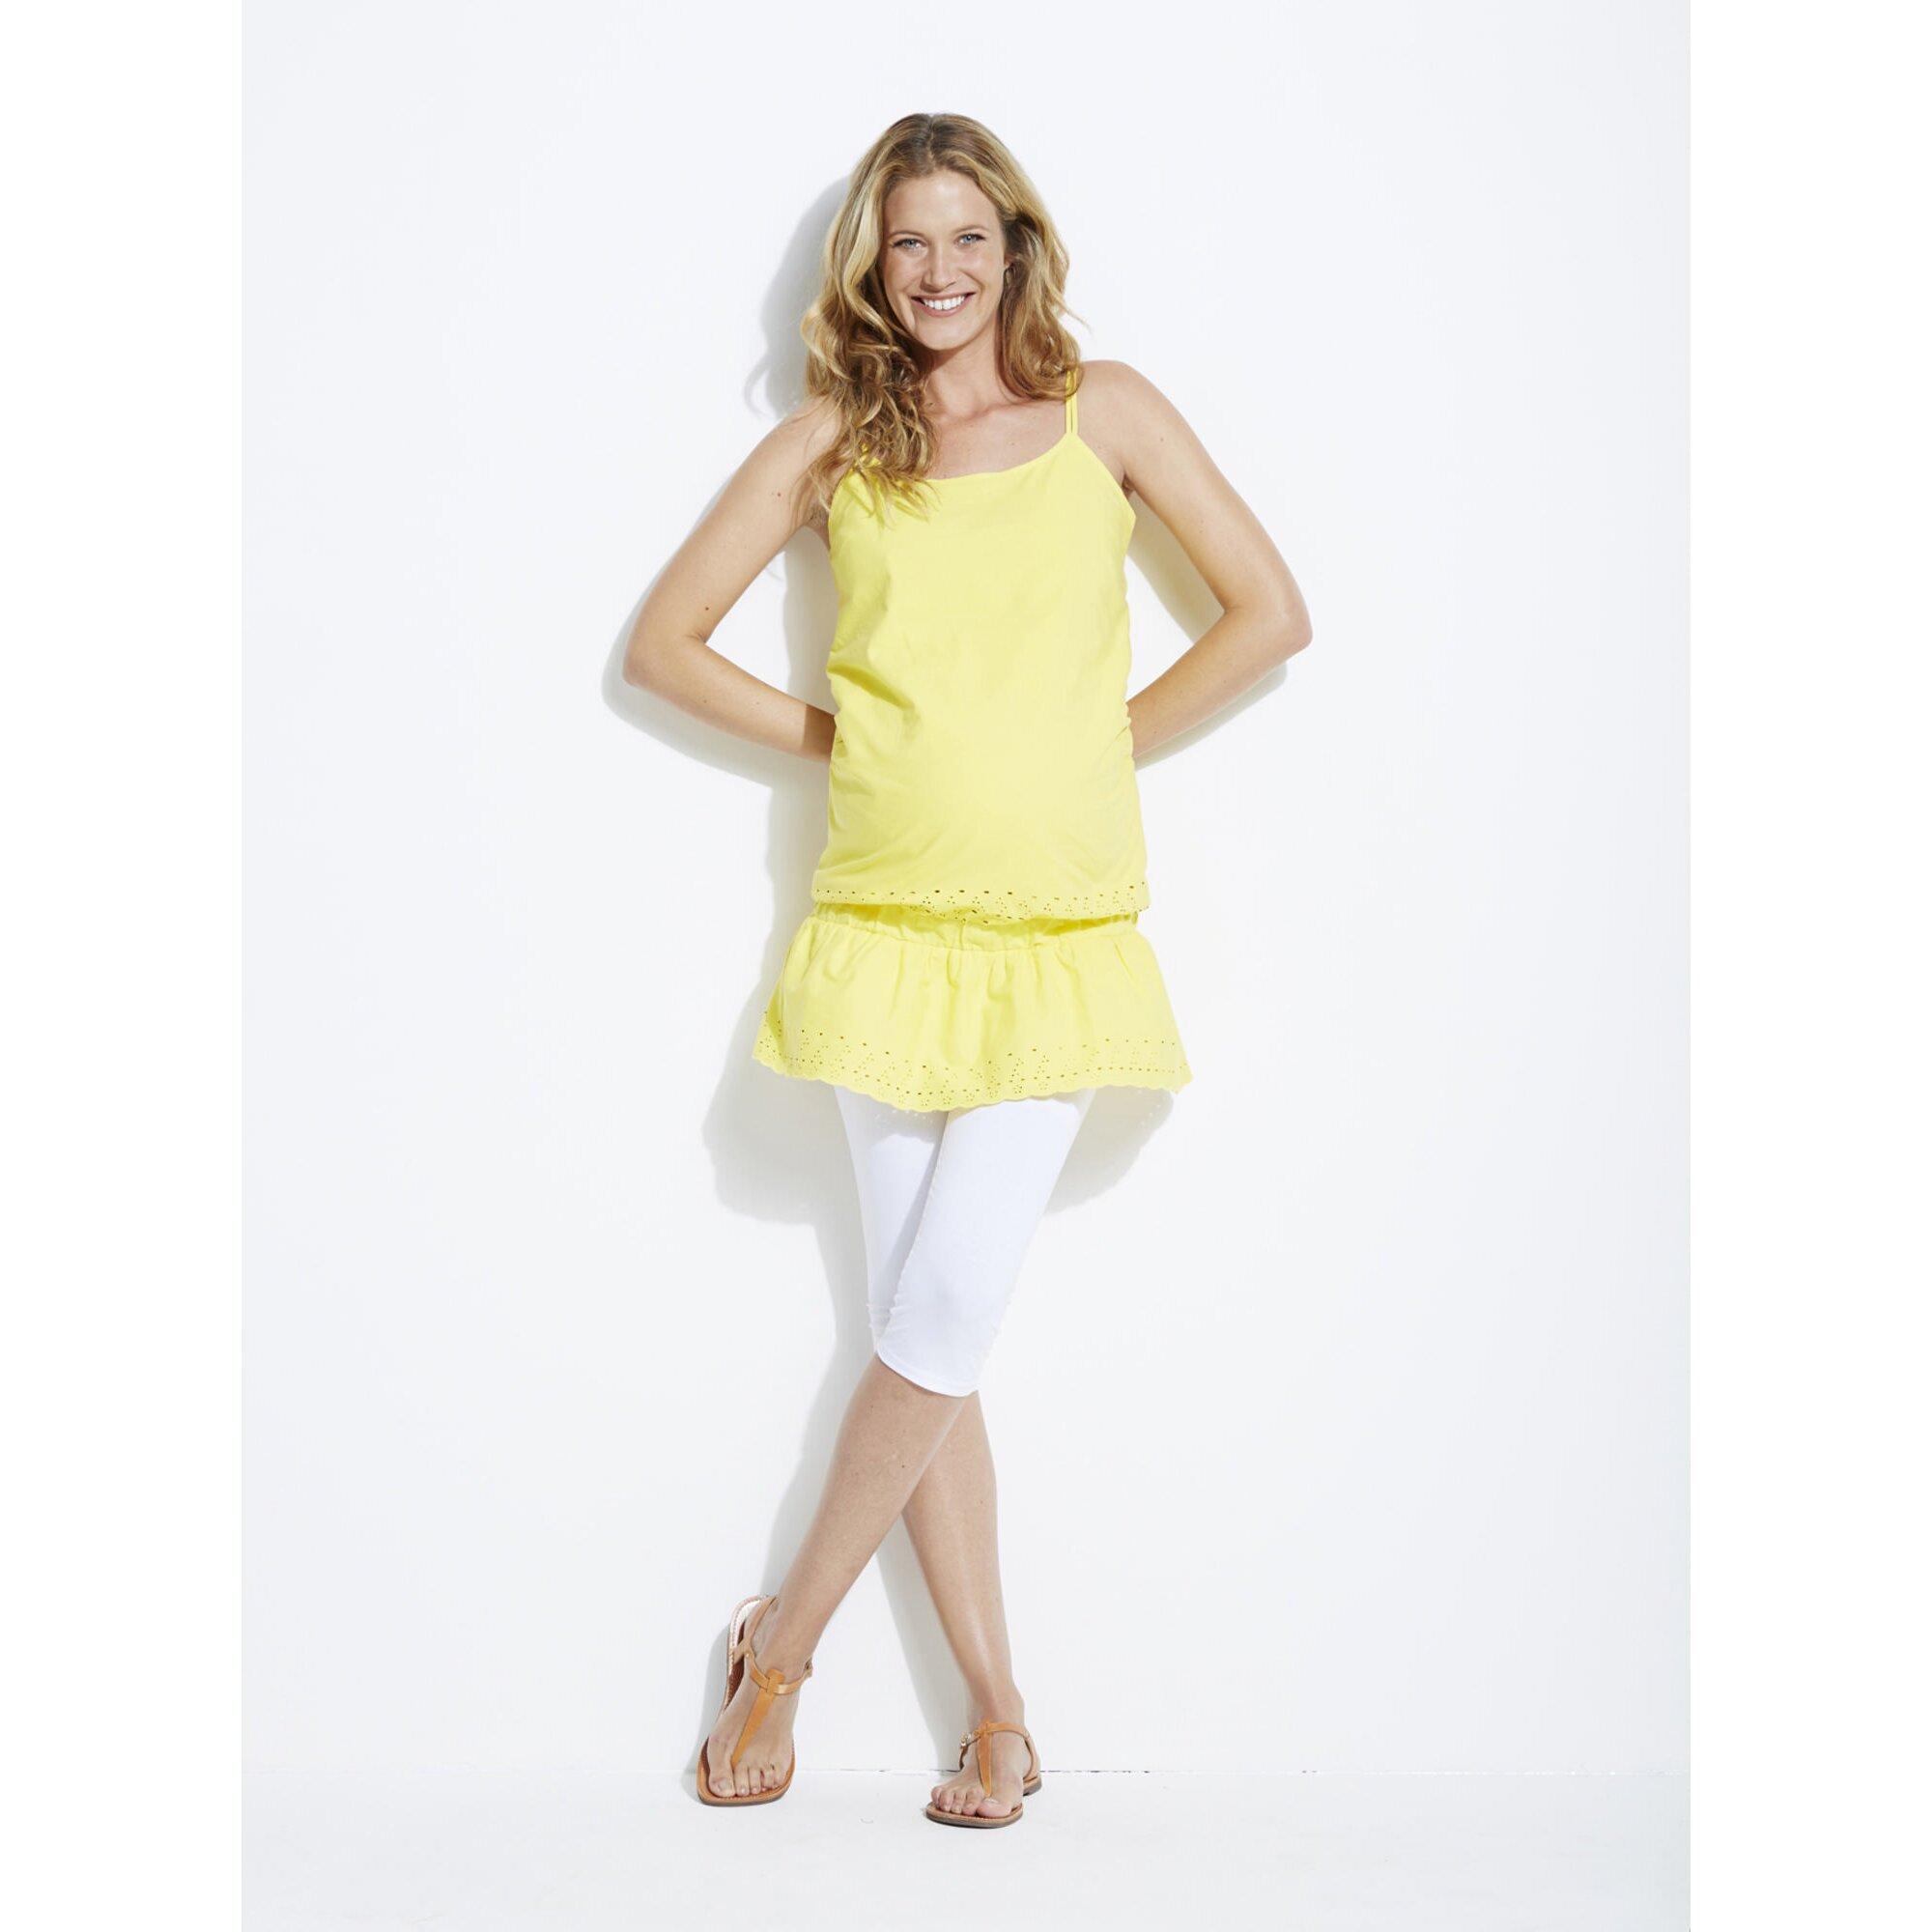 vertbaudet-3-4-leggings-fur-die-schwangerschaft